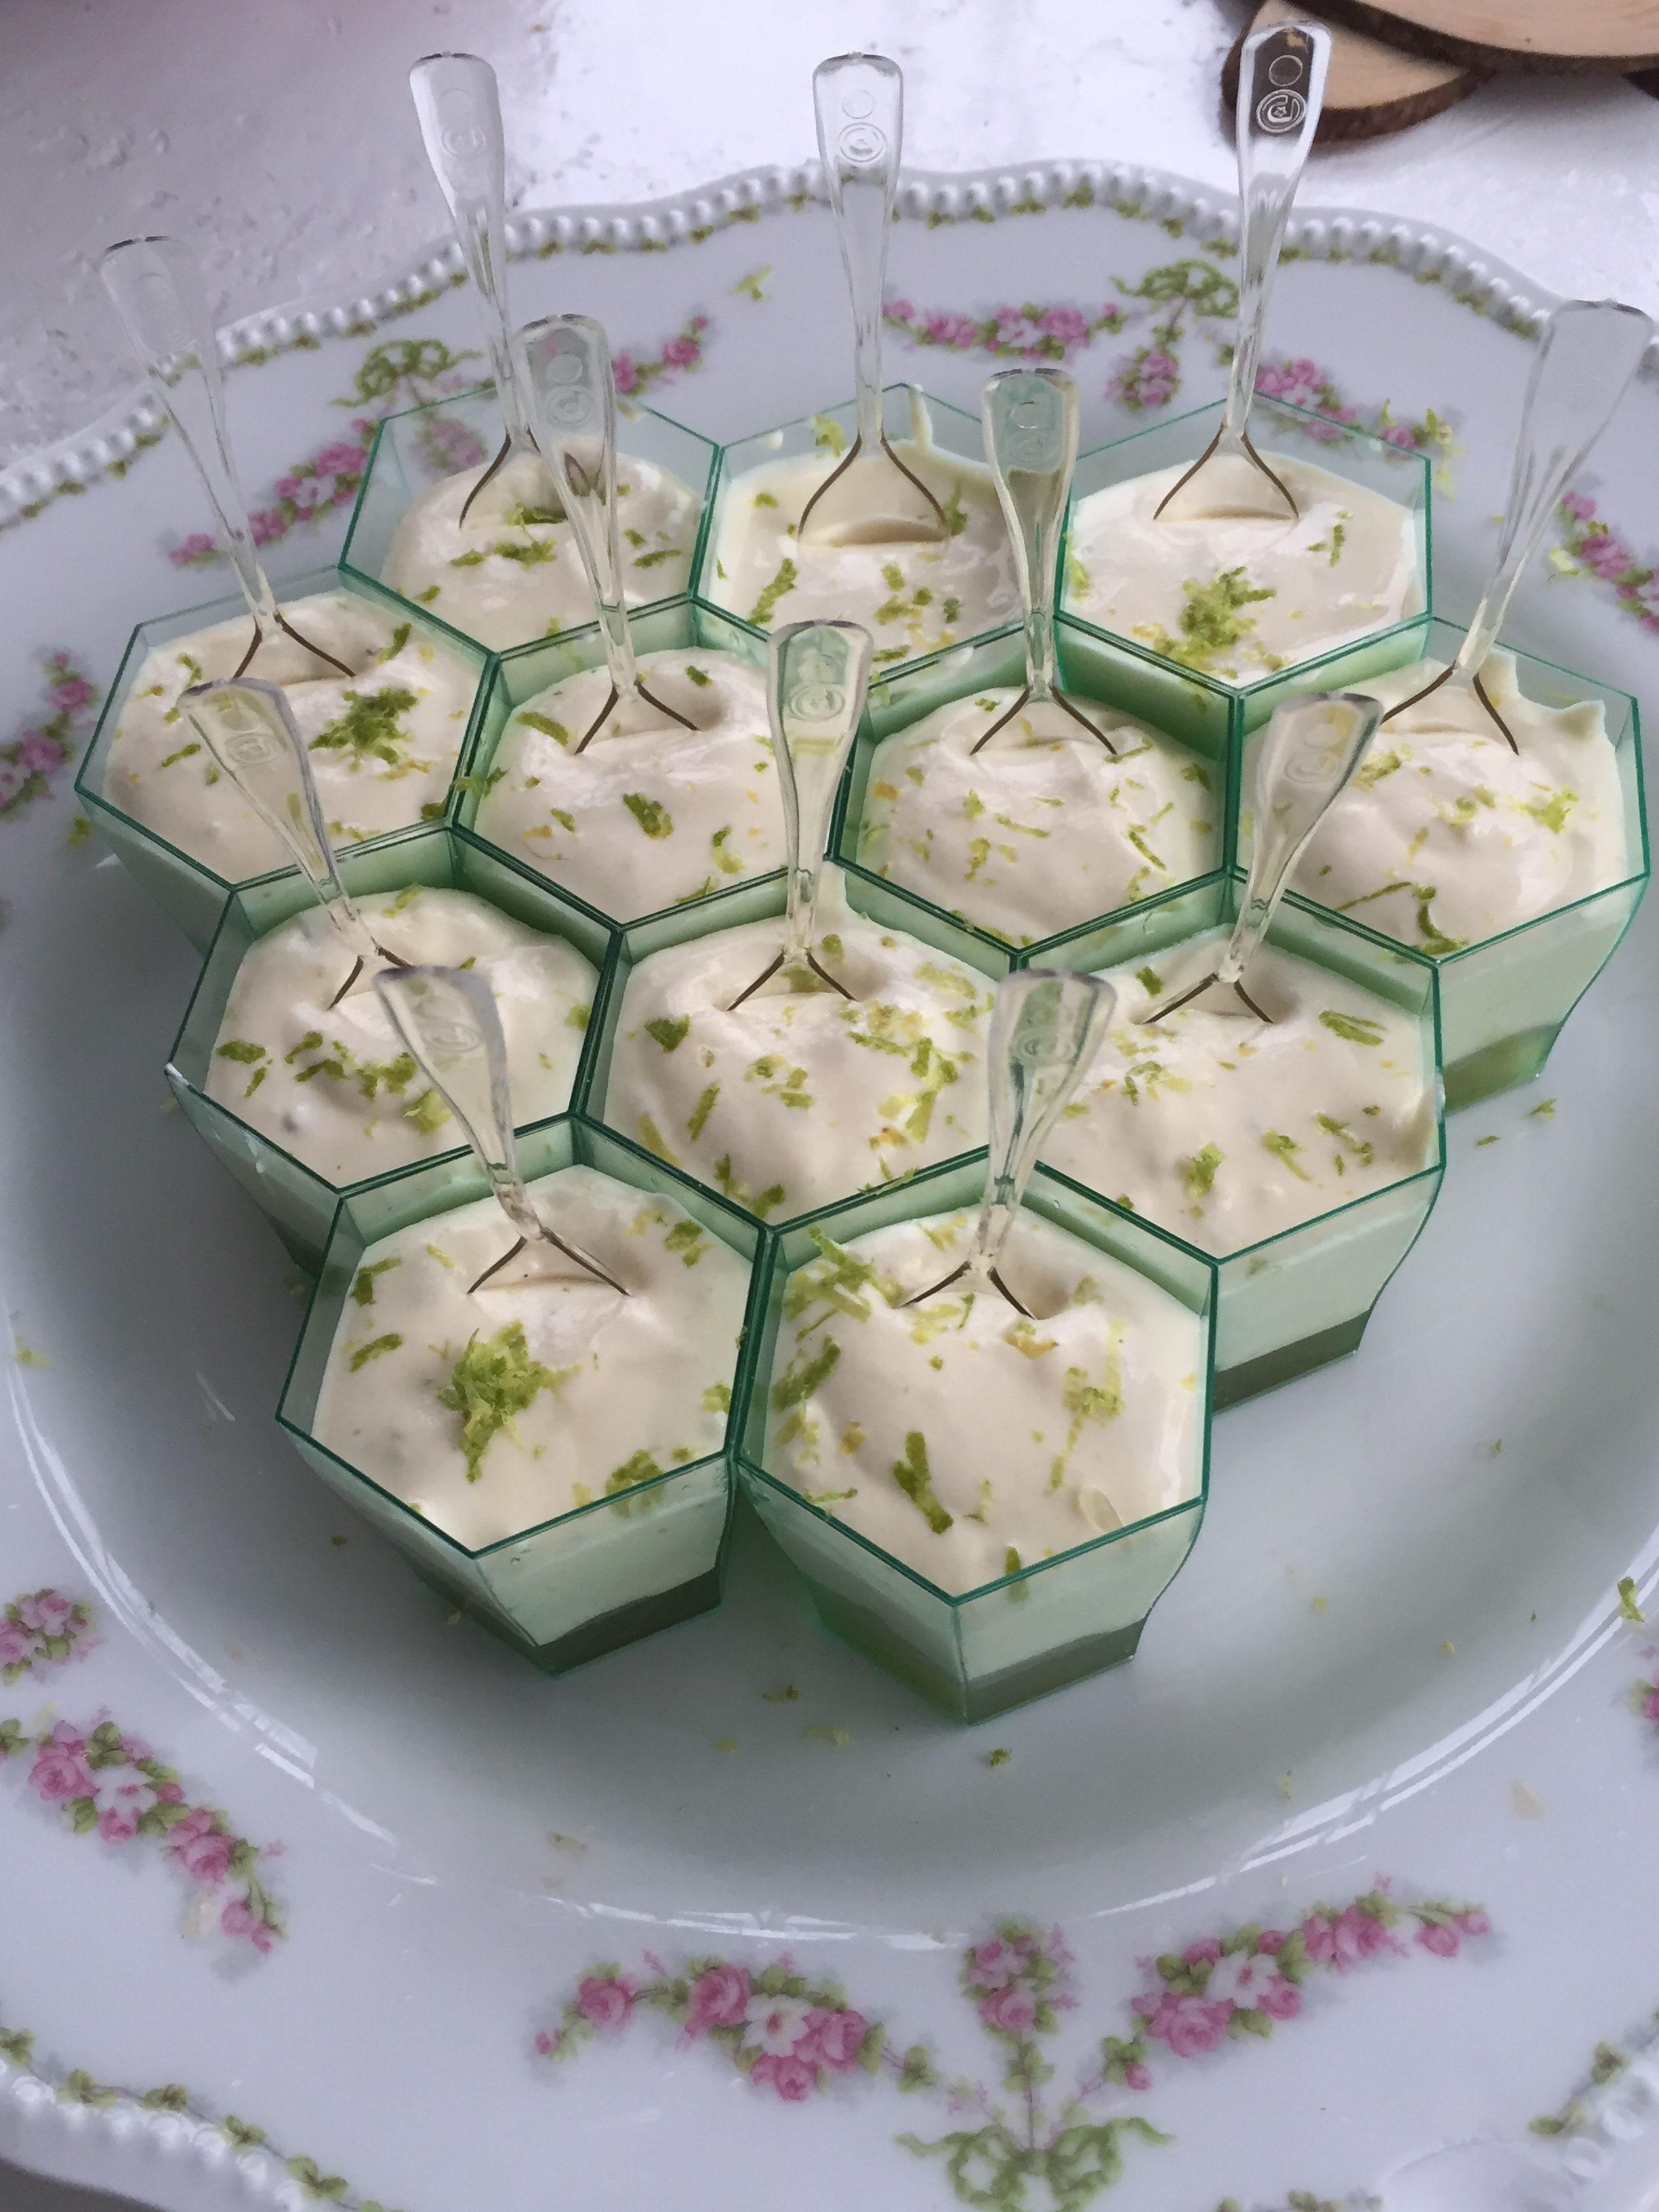 Tiramisu menthe citron vert recette Christophe Michalak